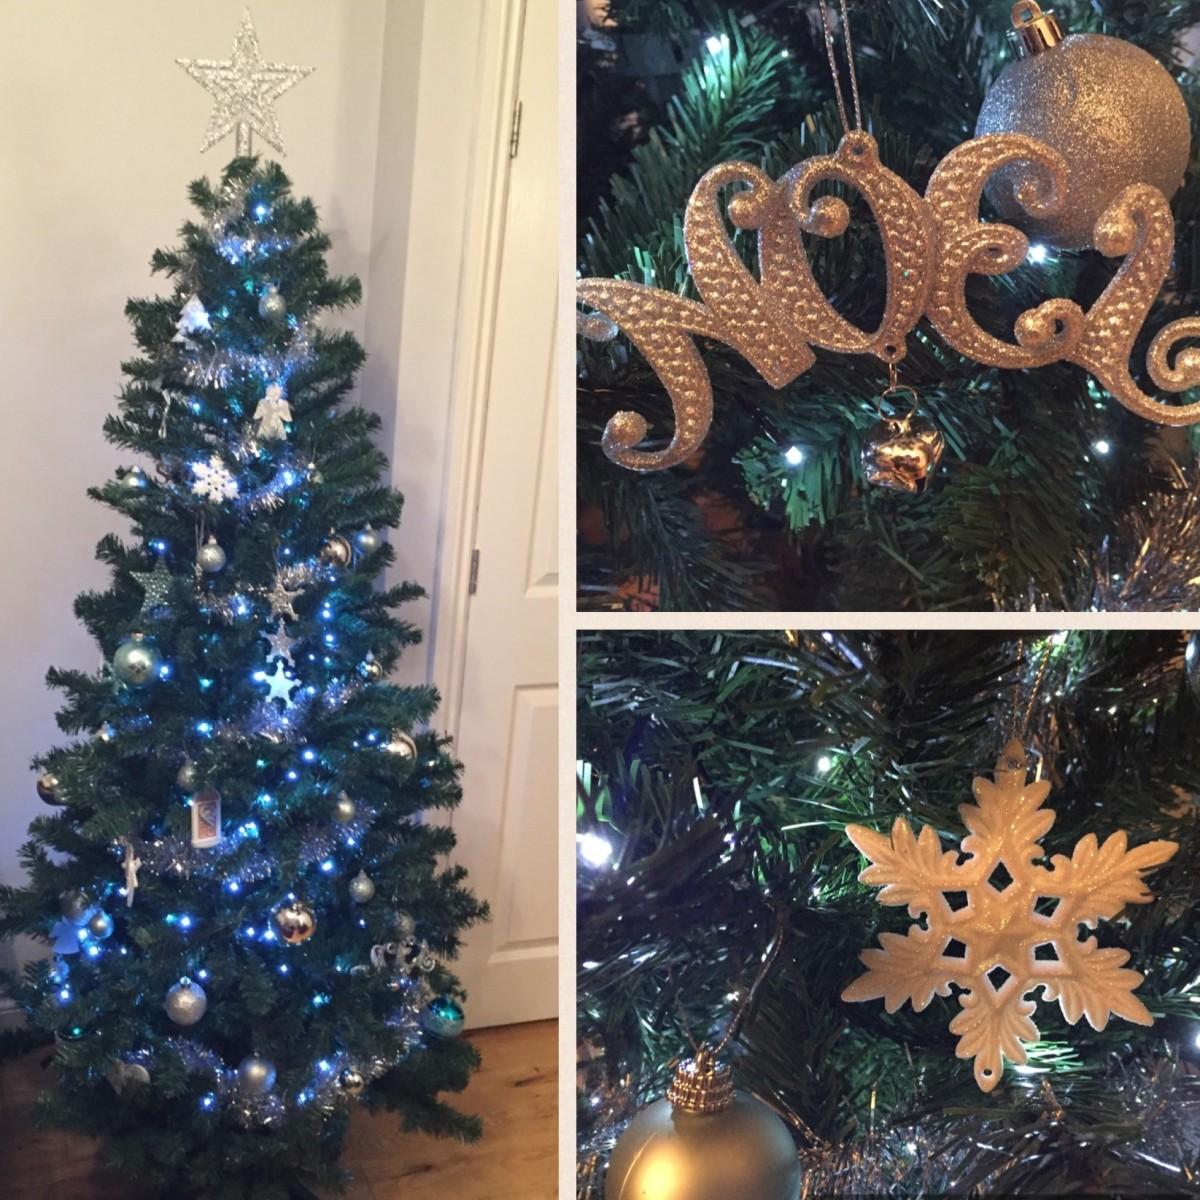 Ho-ho-hoping for a Bright Christmas…